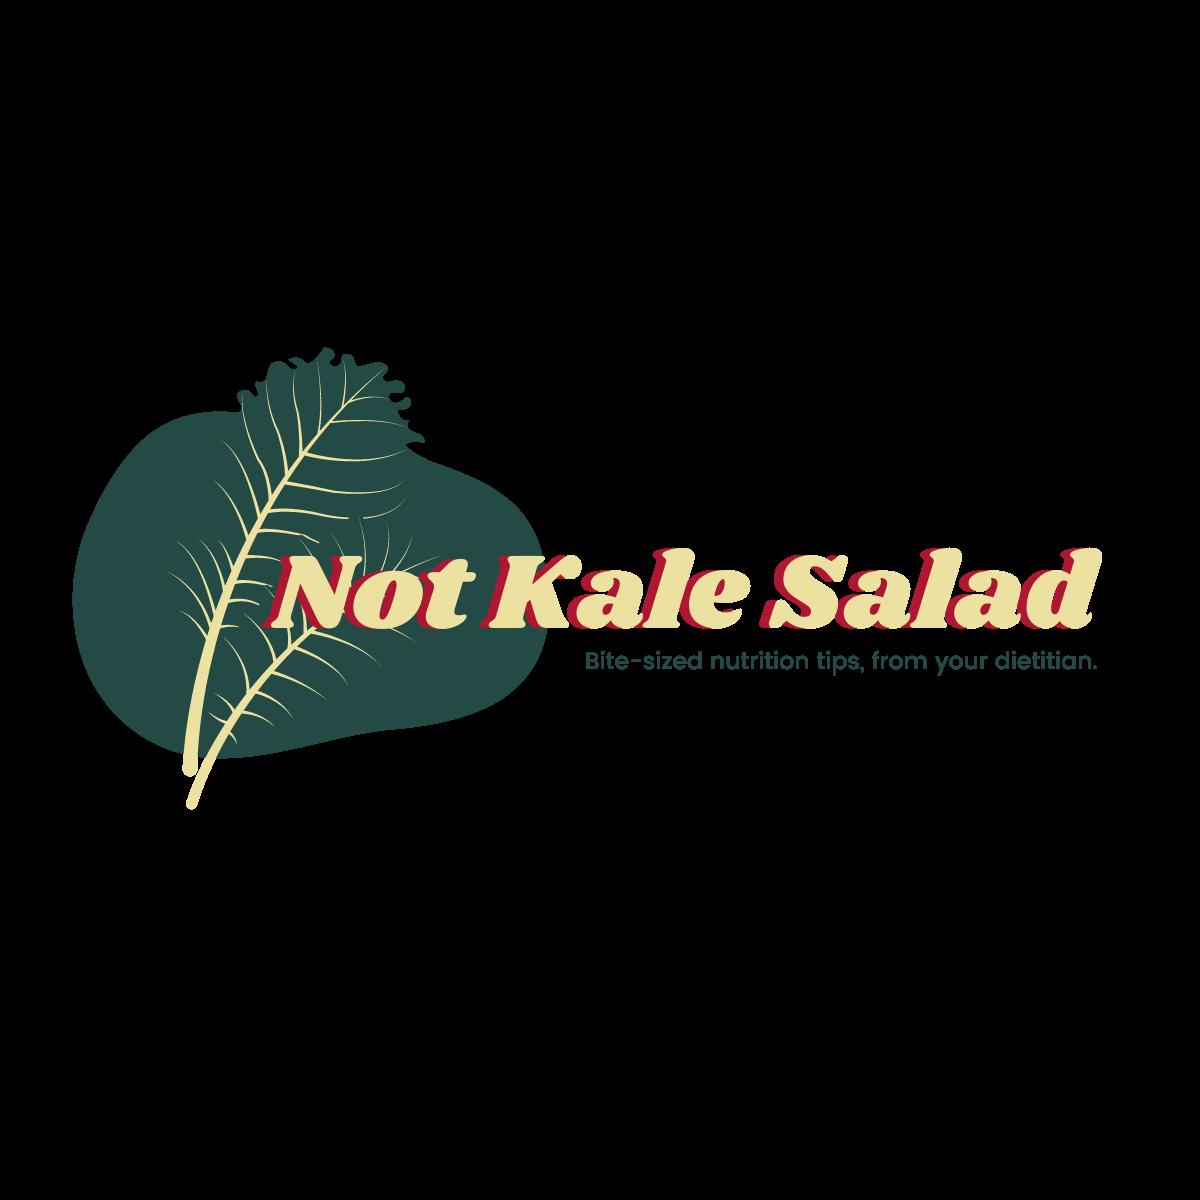 Not Kale Salad